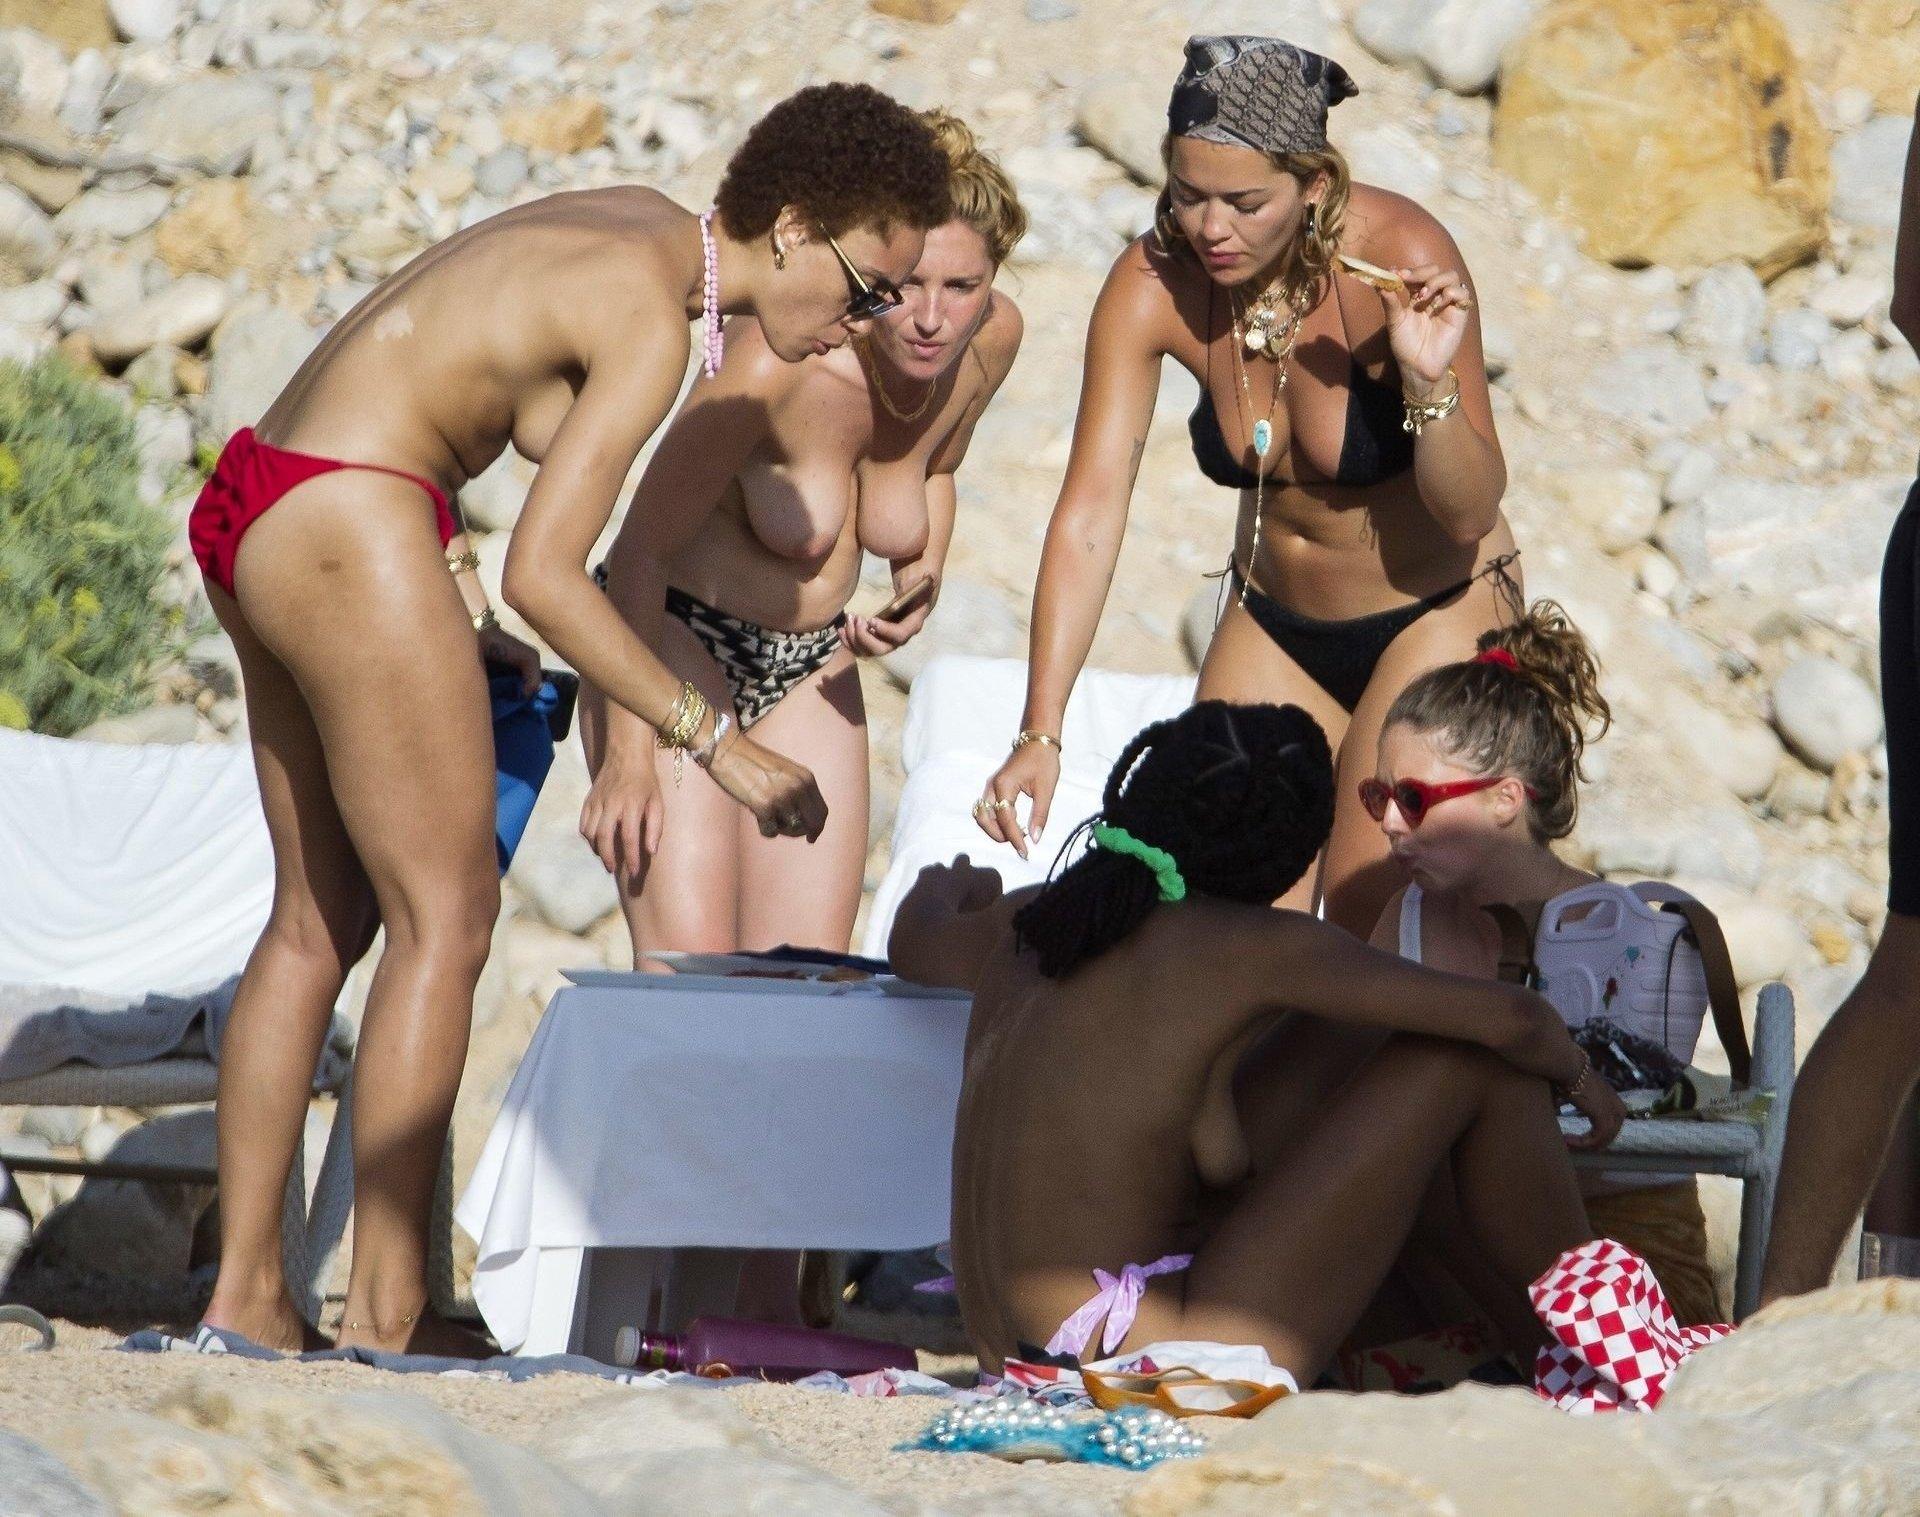 Rita Ora Instagram Nude Leaks 0012